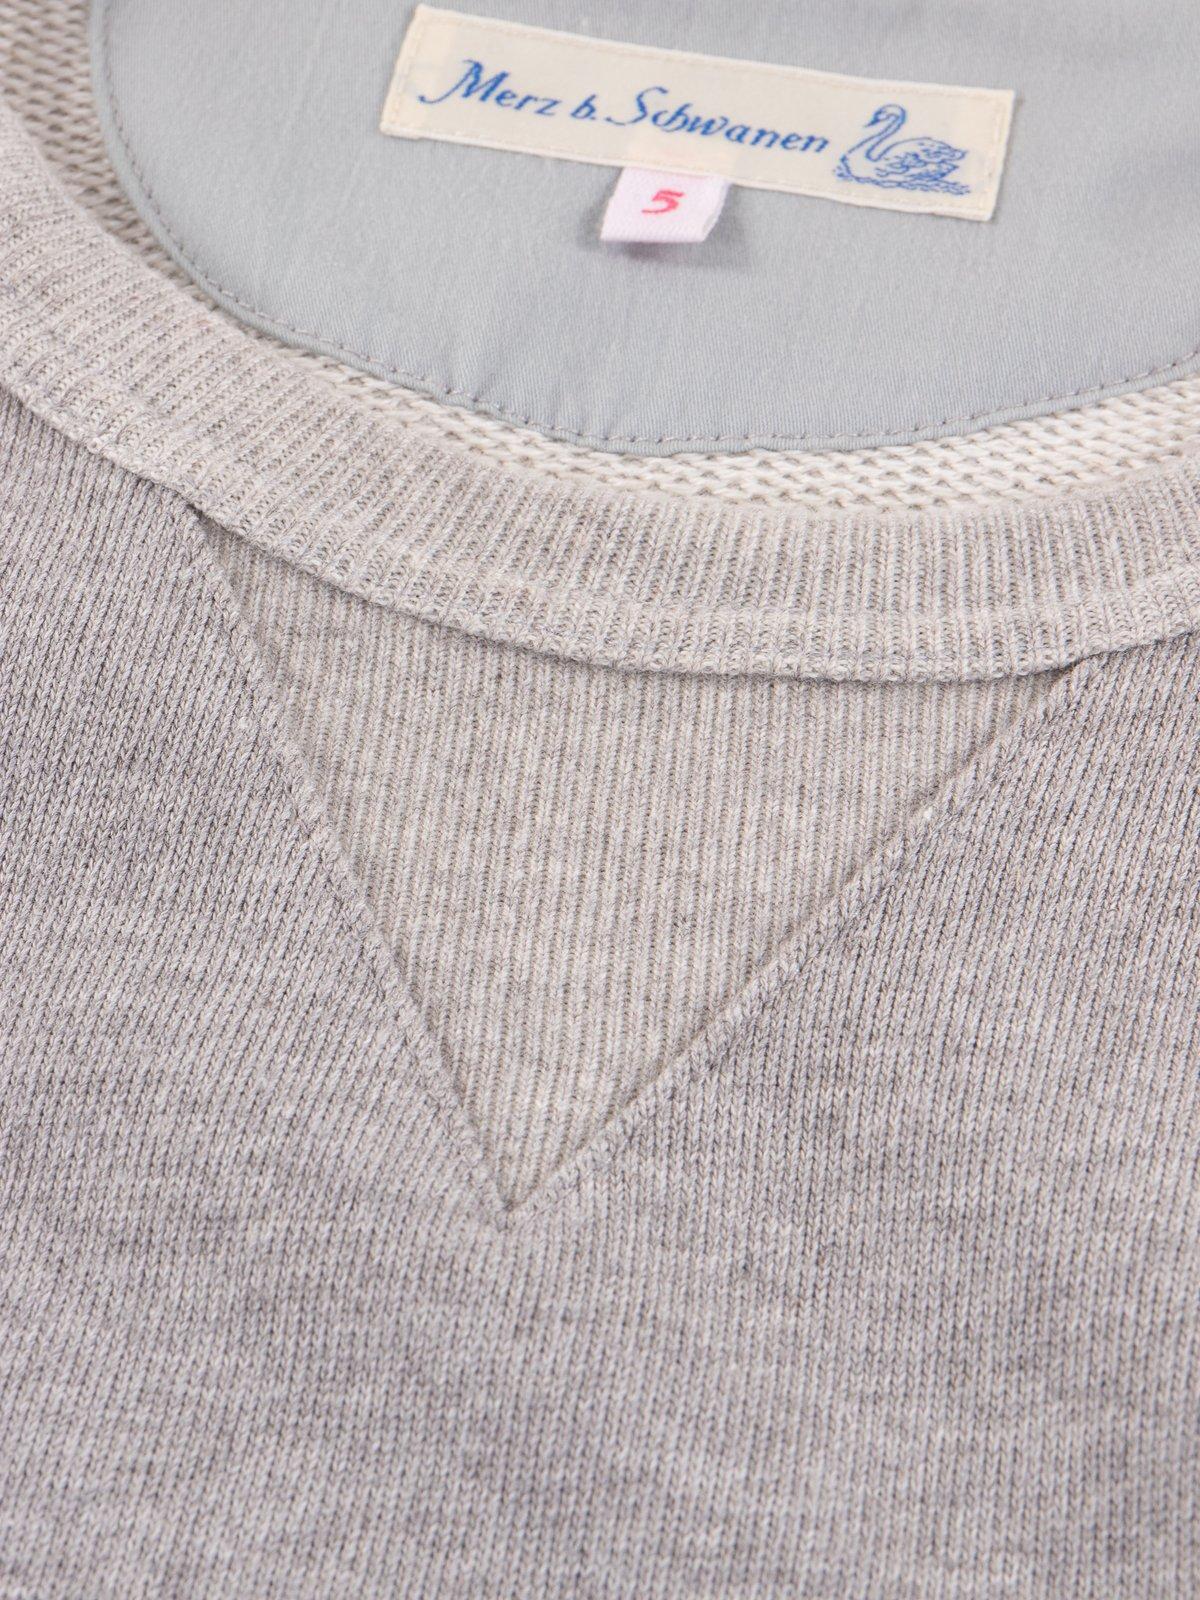 Grey Melange 3S48 Organic Cotton Heavy Sweater - Image 4